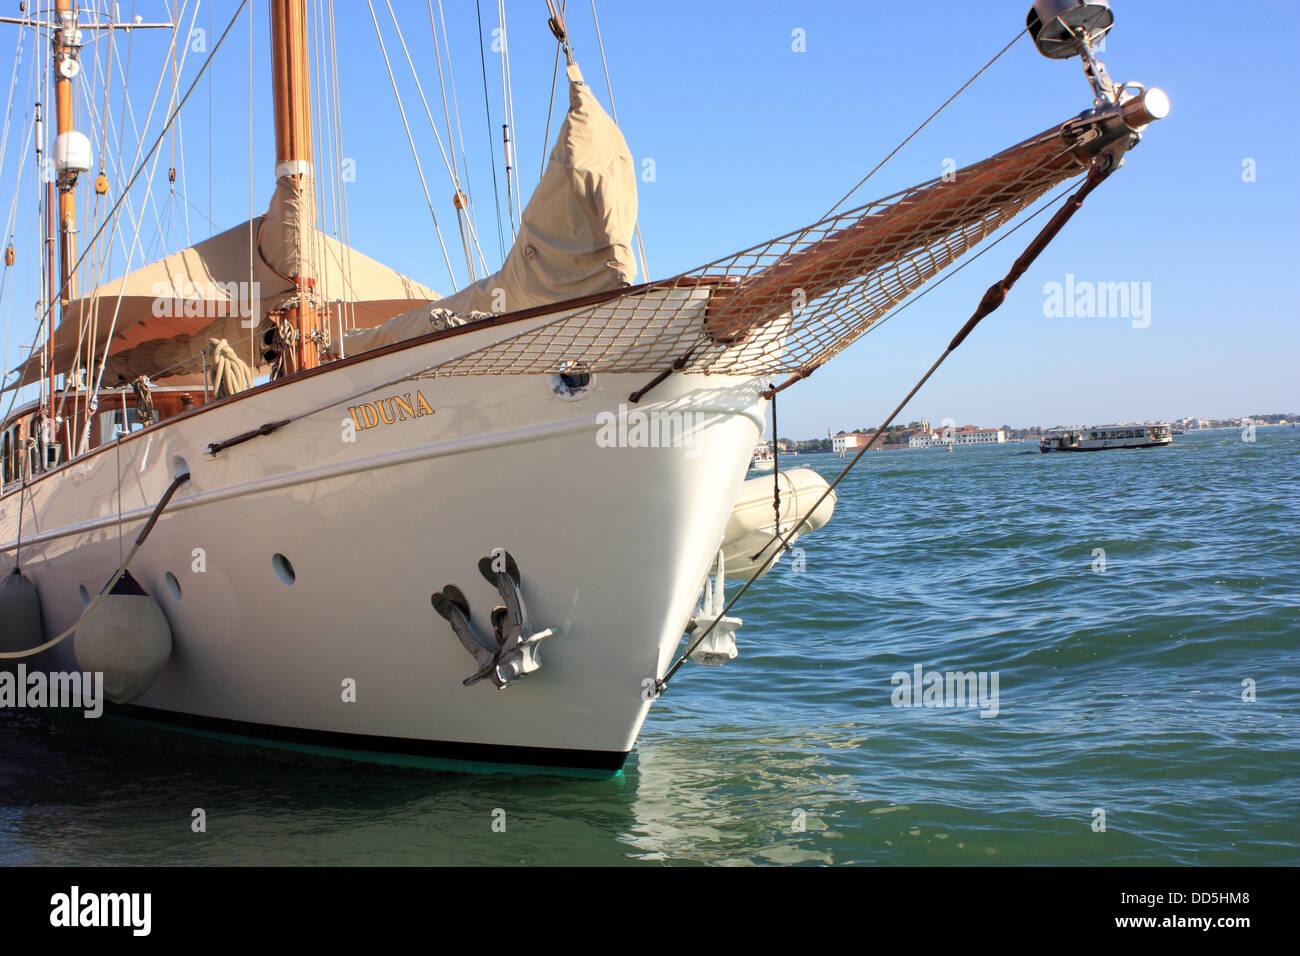 Classic Dutch sailing yacht Iduna - Stock Image